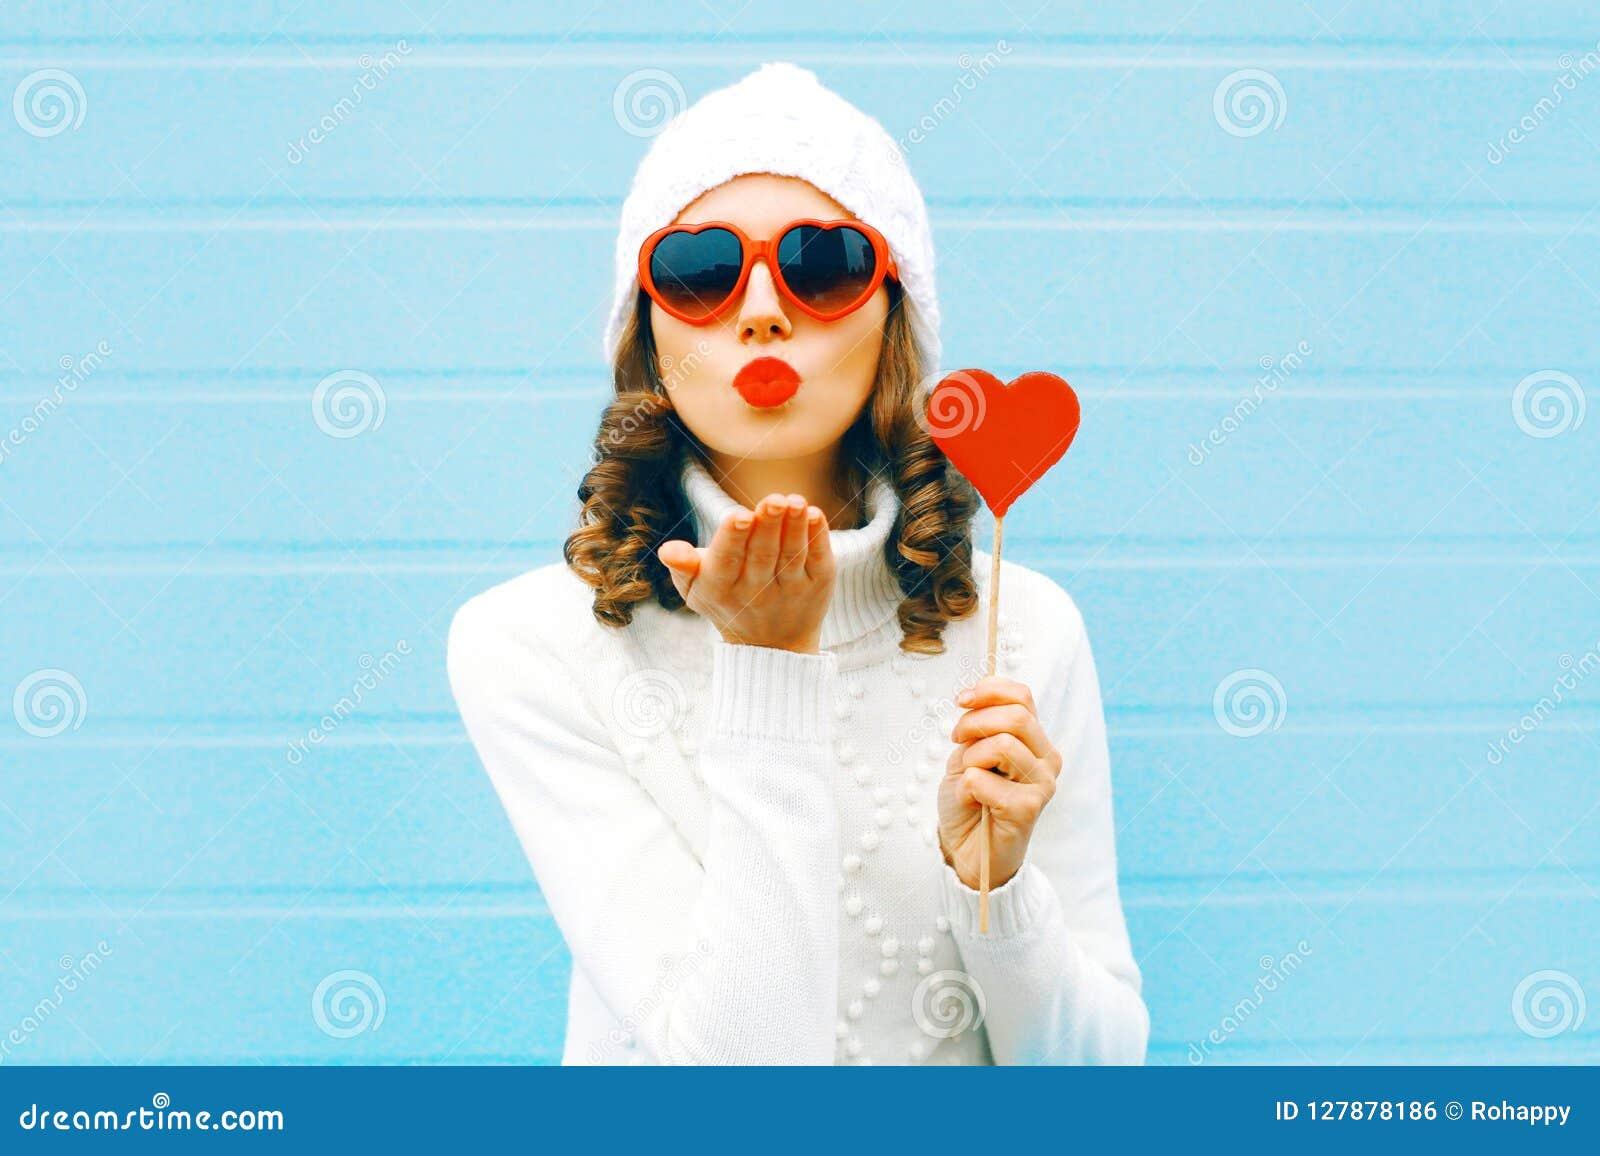 7267ee3625e Η όμορφη γυναίκα πορτρέτου που φυσά τα κόκκινα χείλια στέλνει το ...